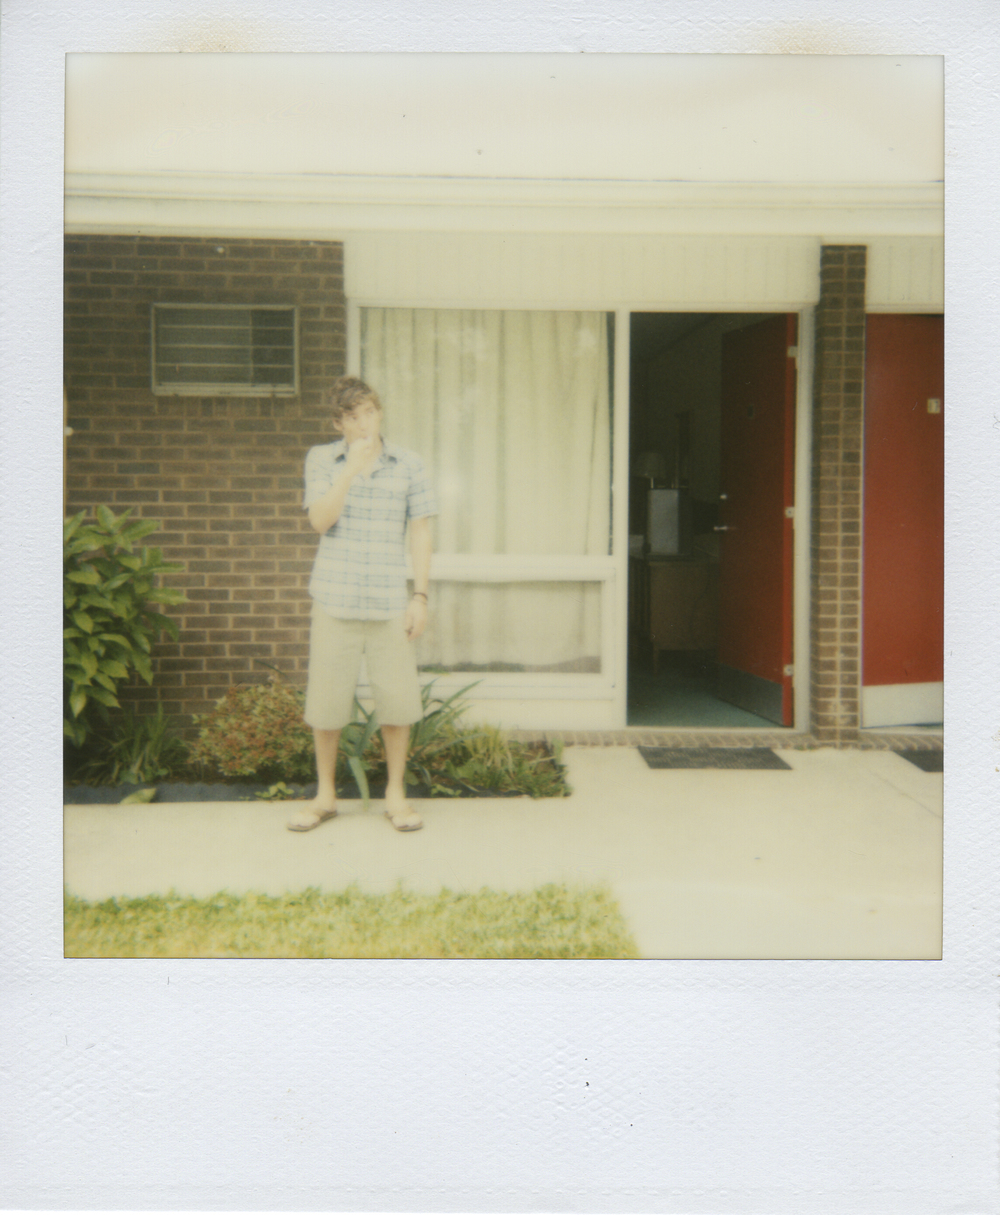 jlaurence-polaroid-040.jpg